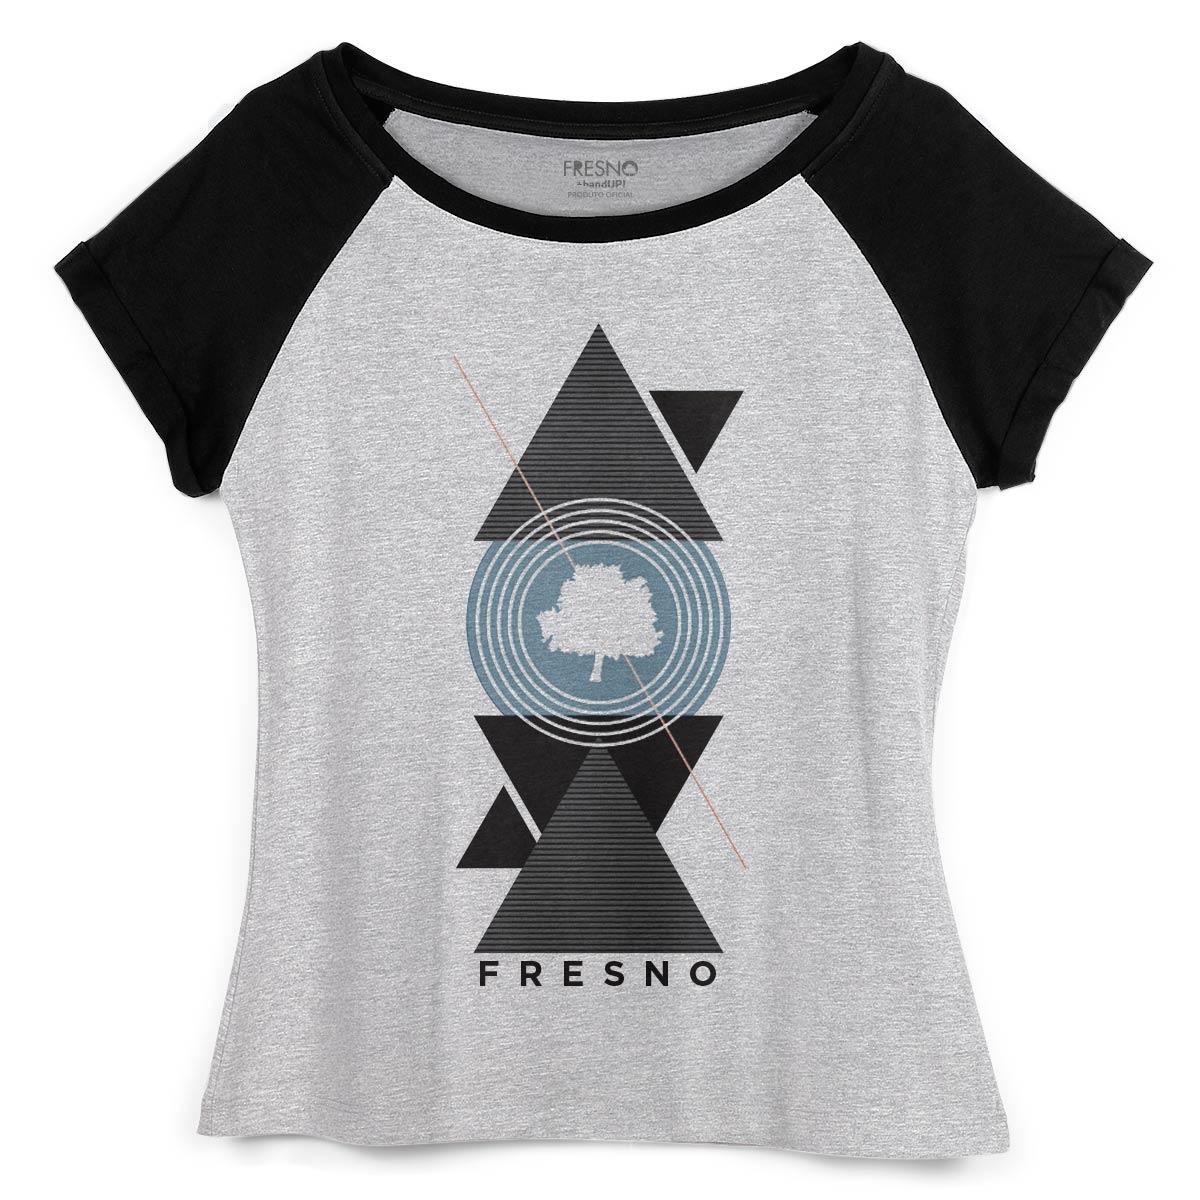 Camiseta Raglan Feminina Fresno Geometric